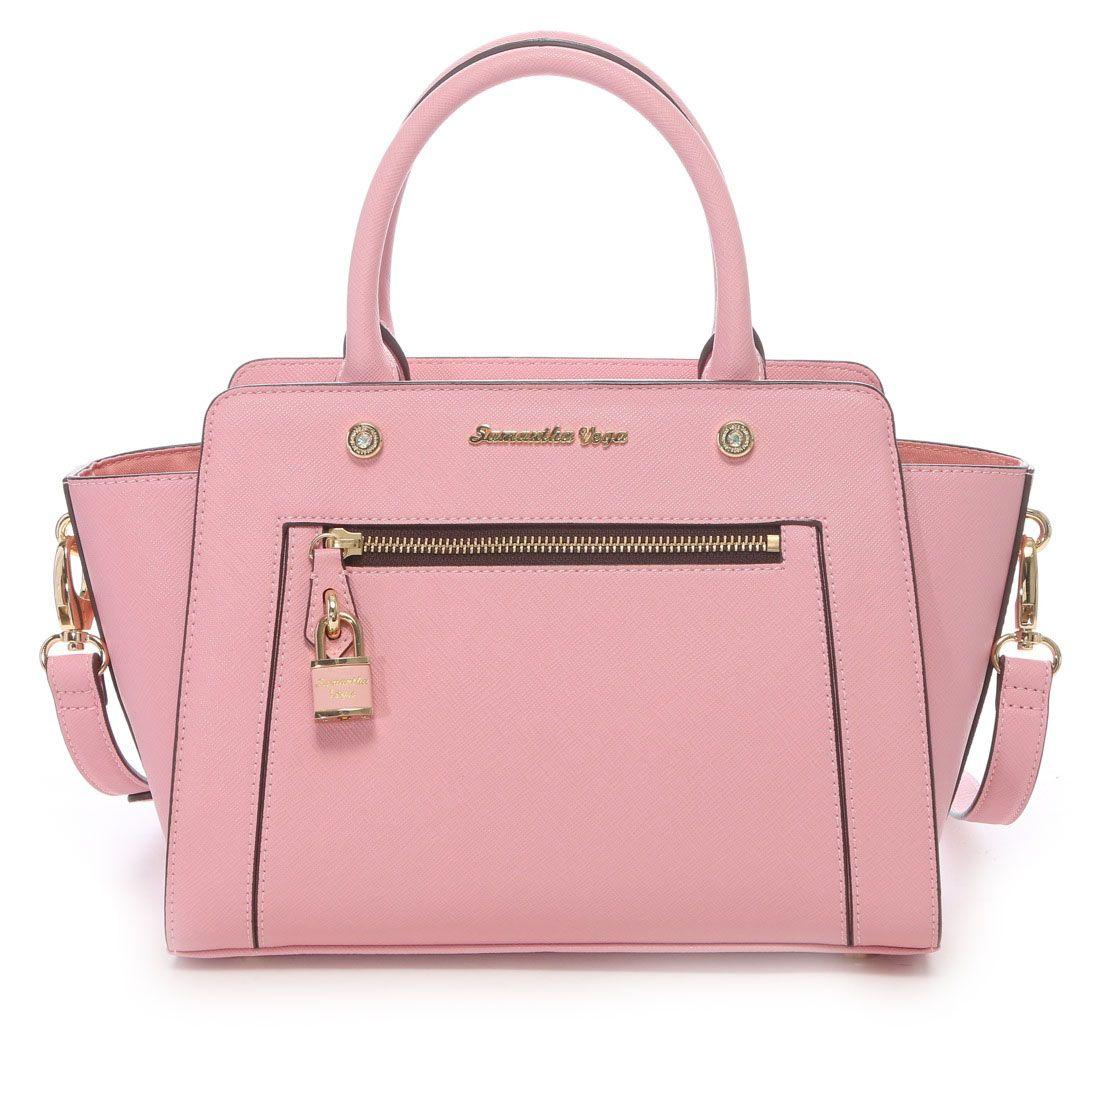 6511fc6a484f Samantha Thavasa サマンサベガ フロントジップトートバッグ 中(ベビーピンク) -靴とファッション